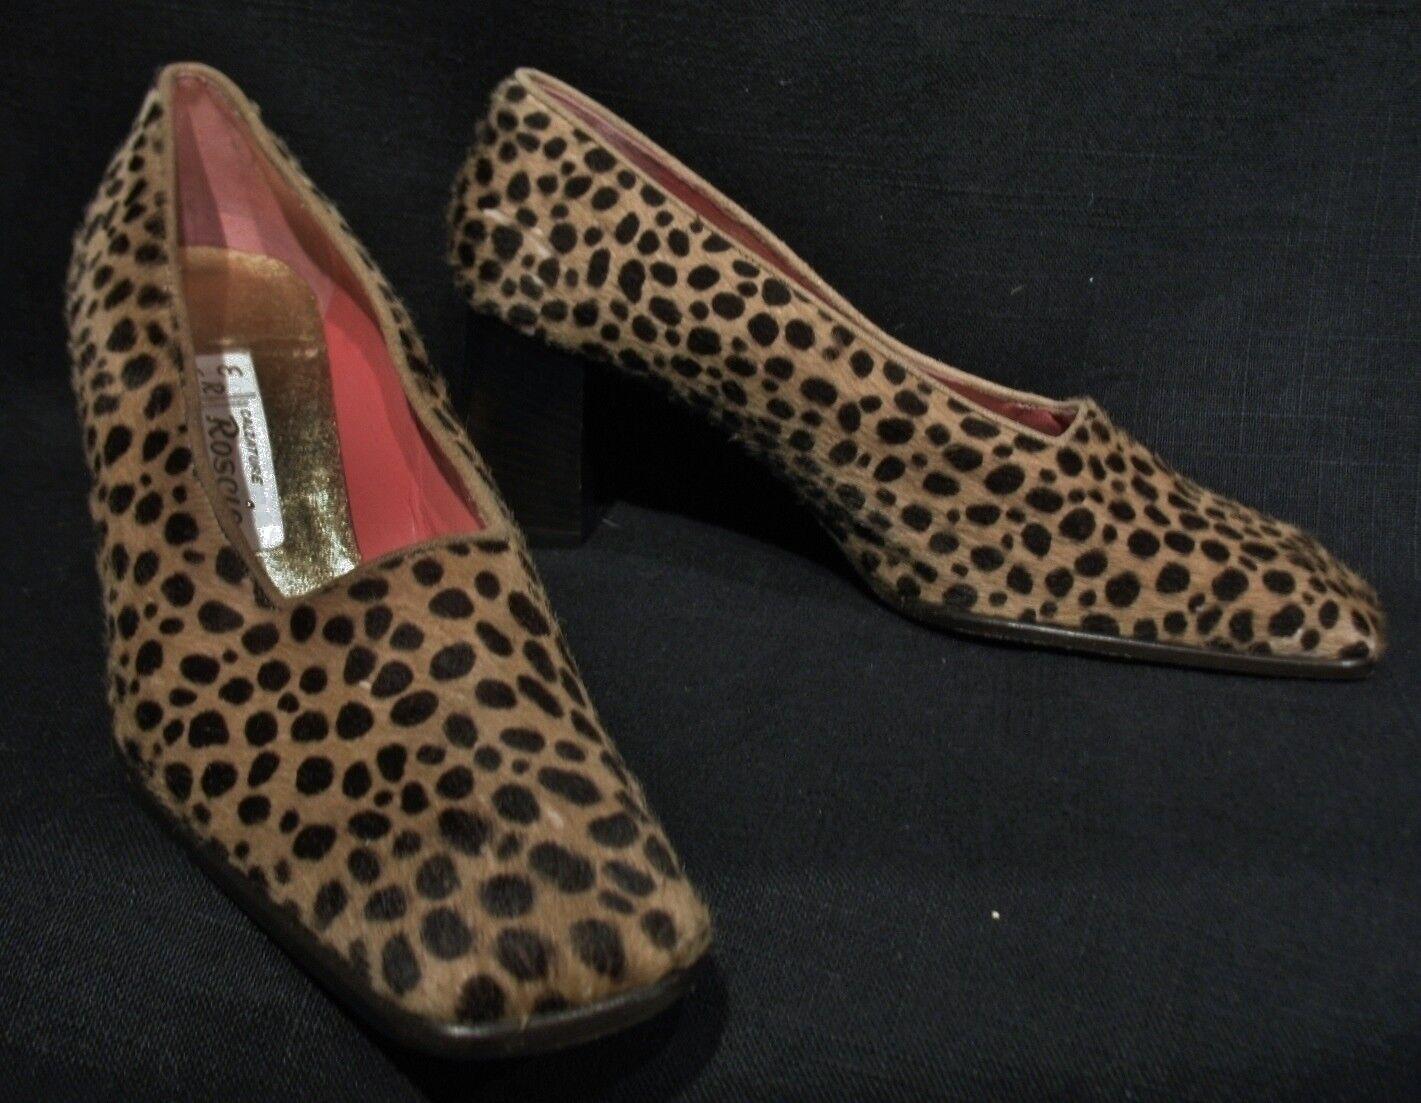 LUXUS Kalbsfell DESIGNER Echt Vintage PELZ LEDER Leo Leopard Vintage Echt Pumps Stöckelschuhe 460c4e